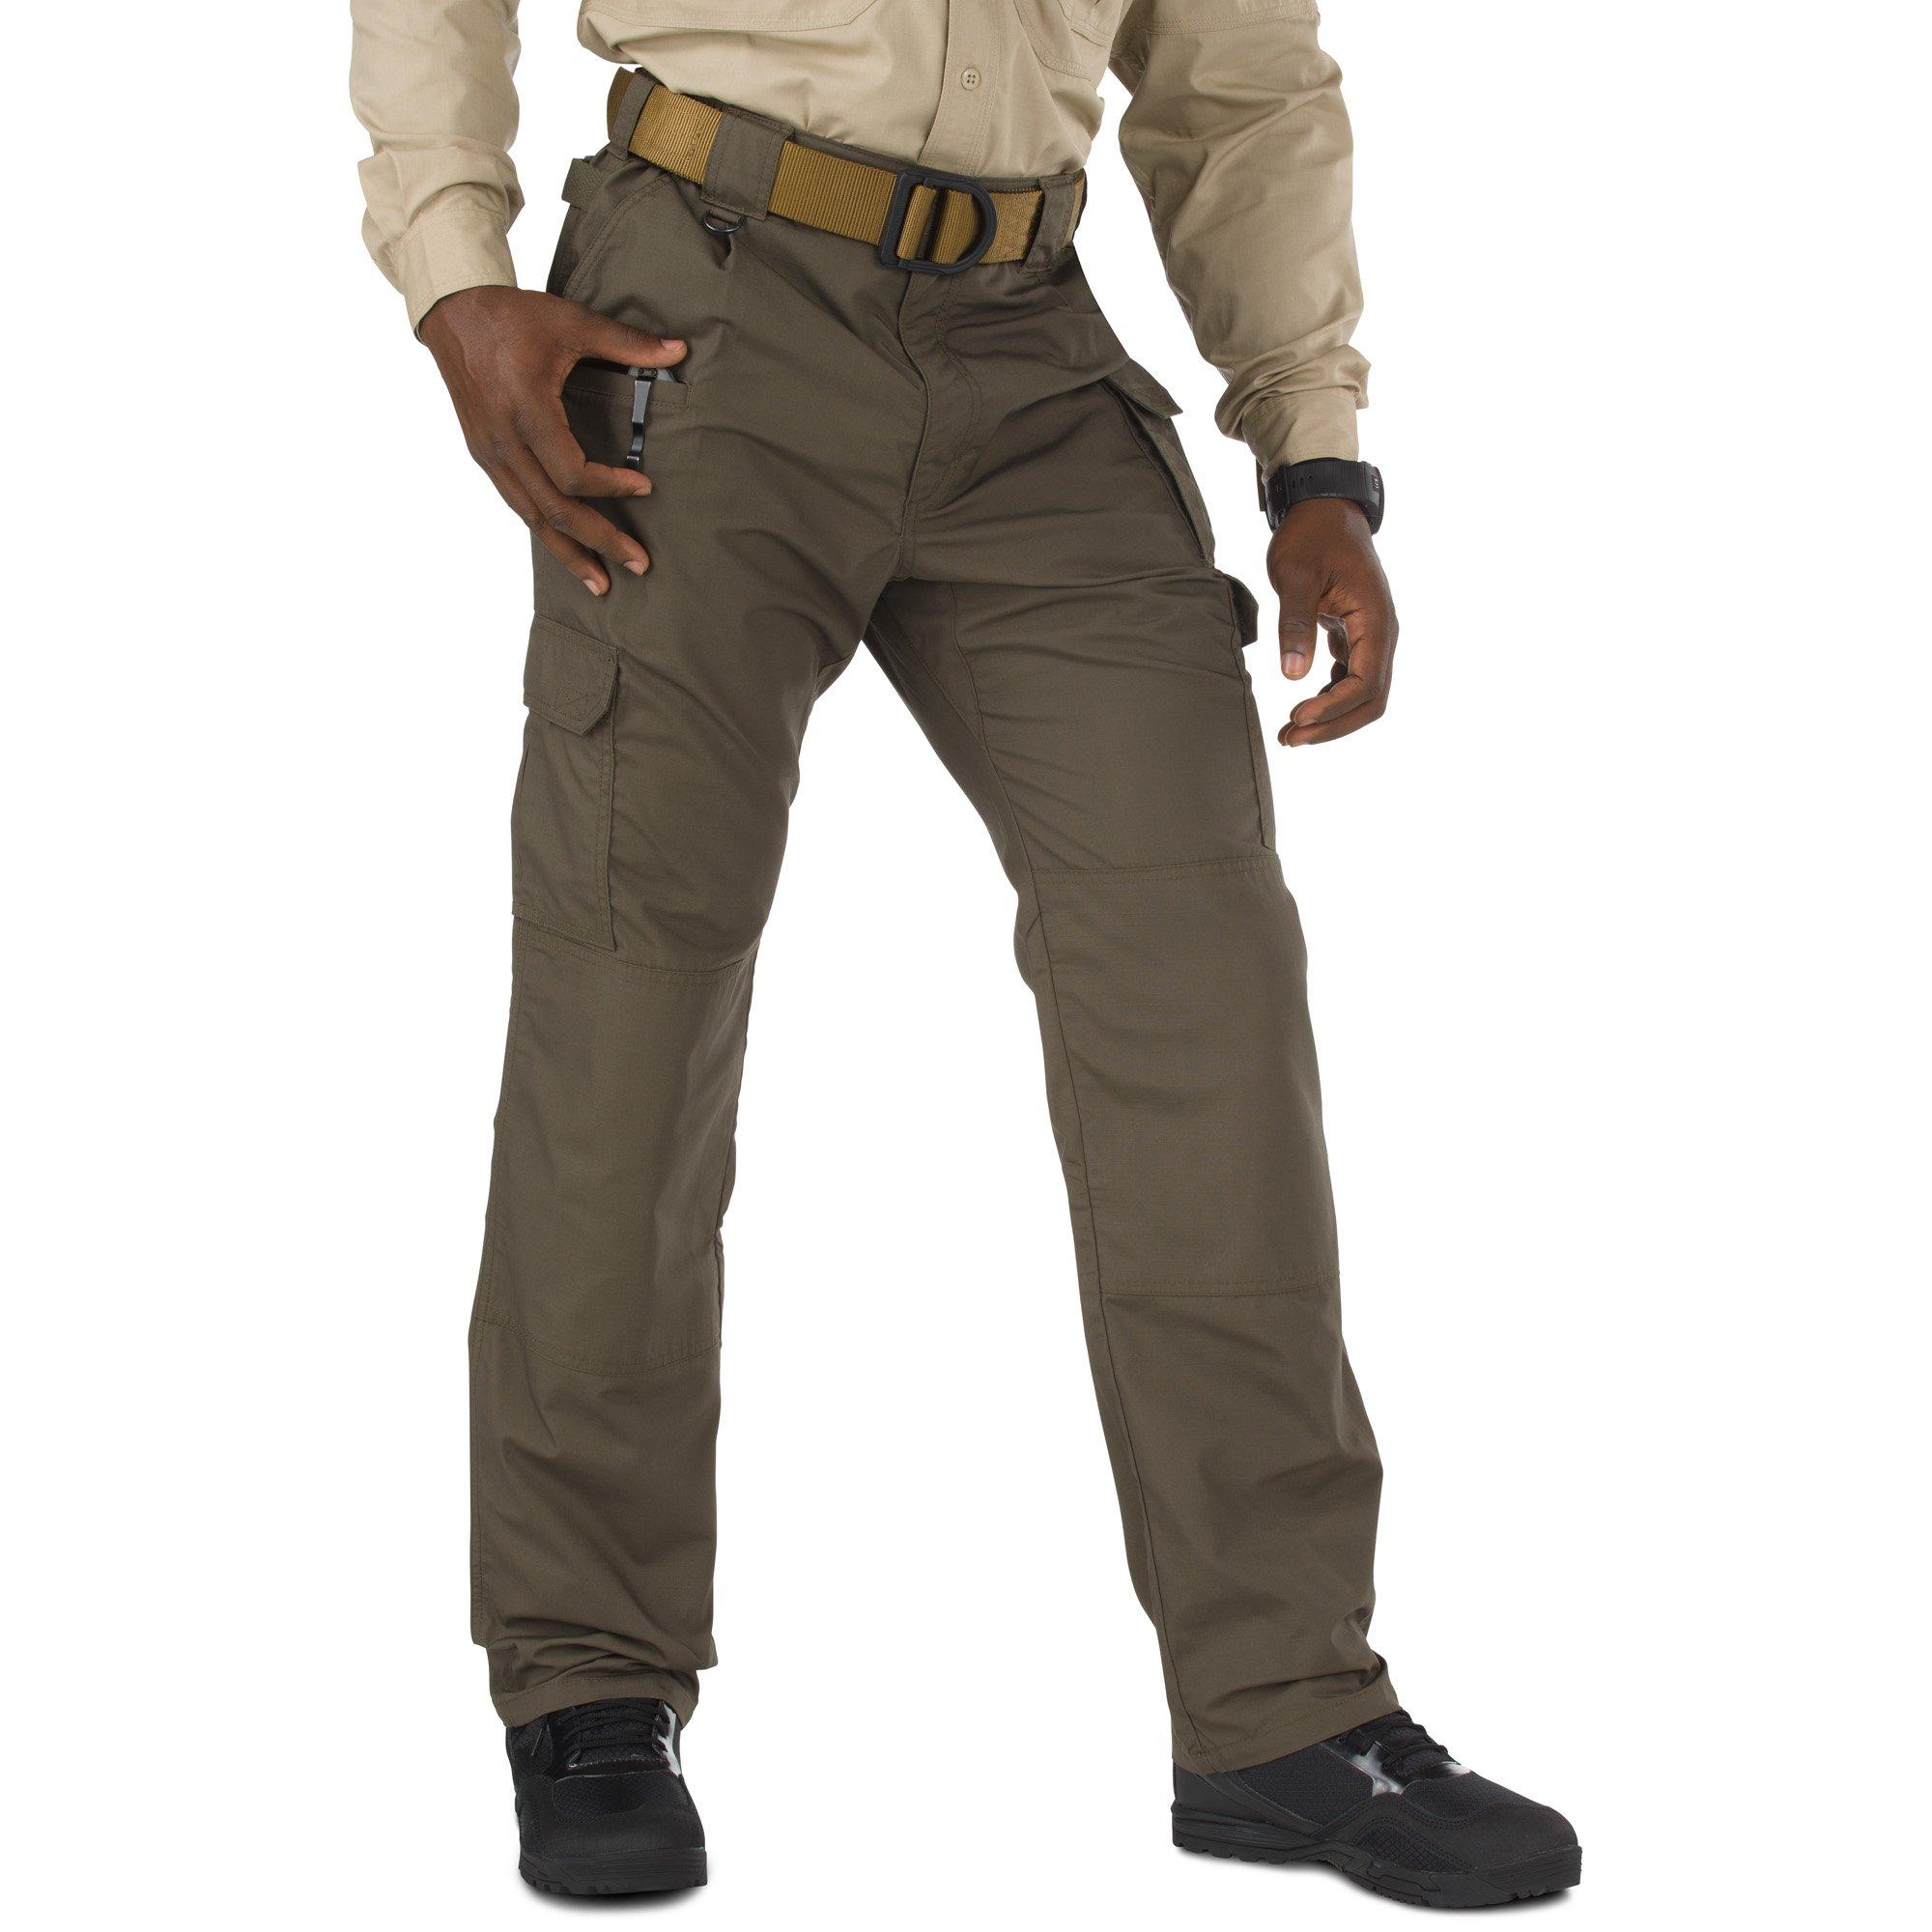 5.11 Men's Taclite Pro Tactical Pants, Style 74273, Tundra, 48W Unhemmed